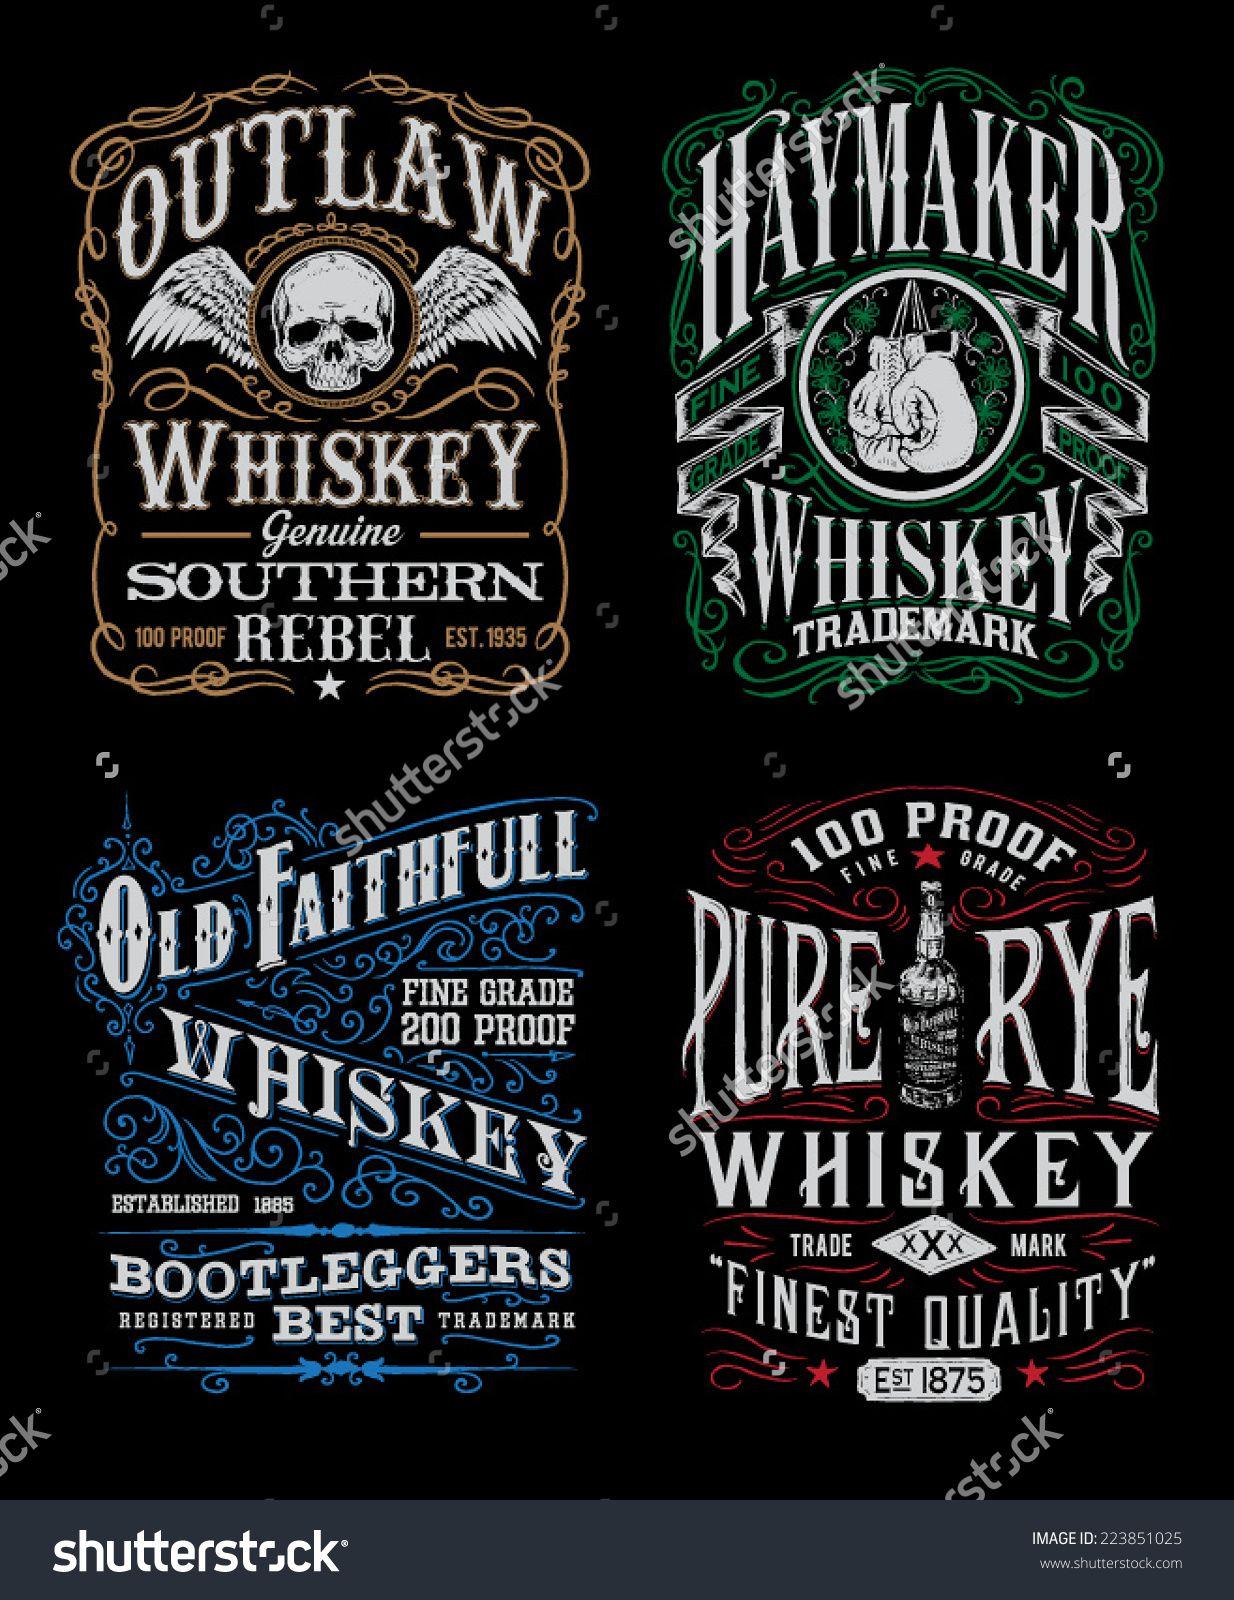 GOOG959.77 (0.67) Whiskey label, Vintage alcohol